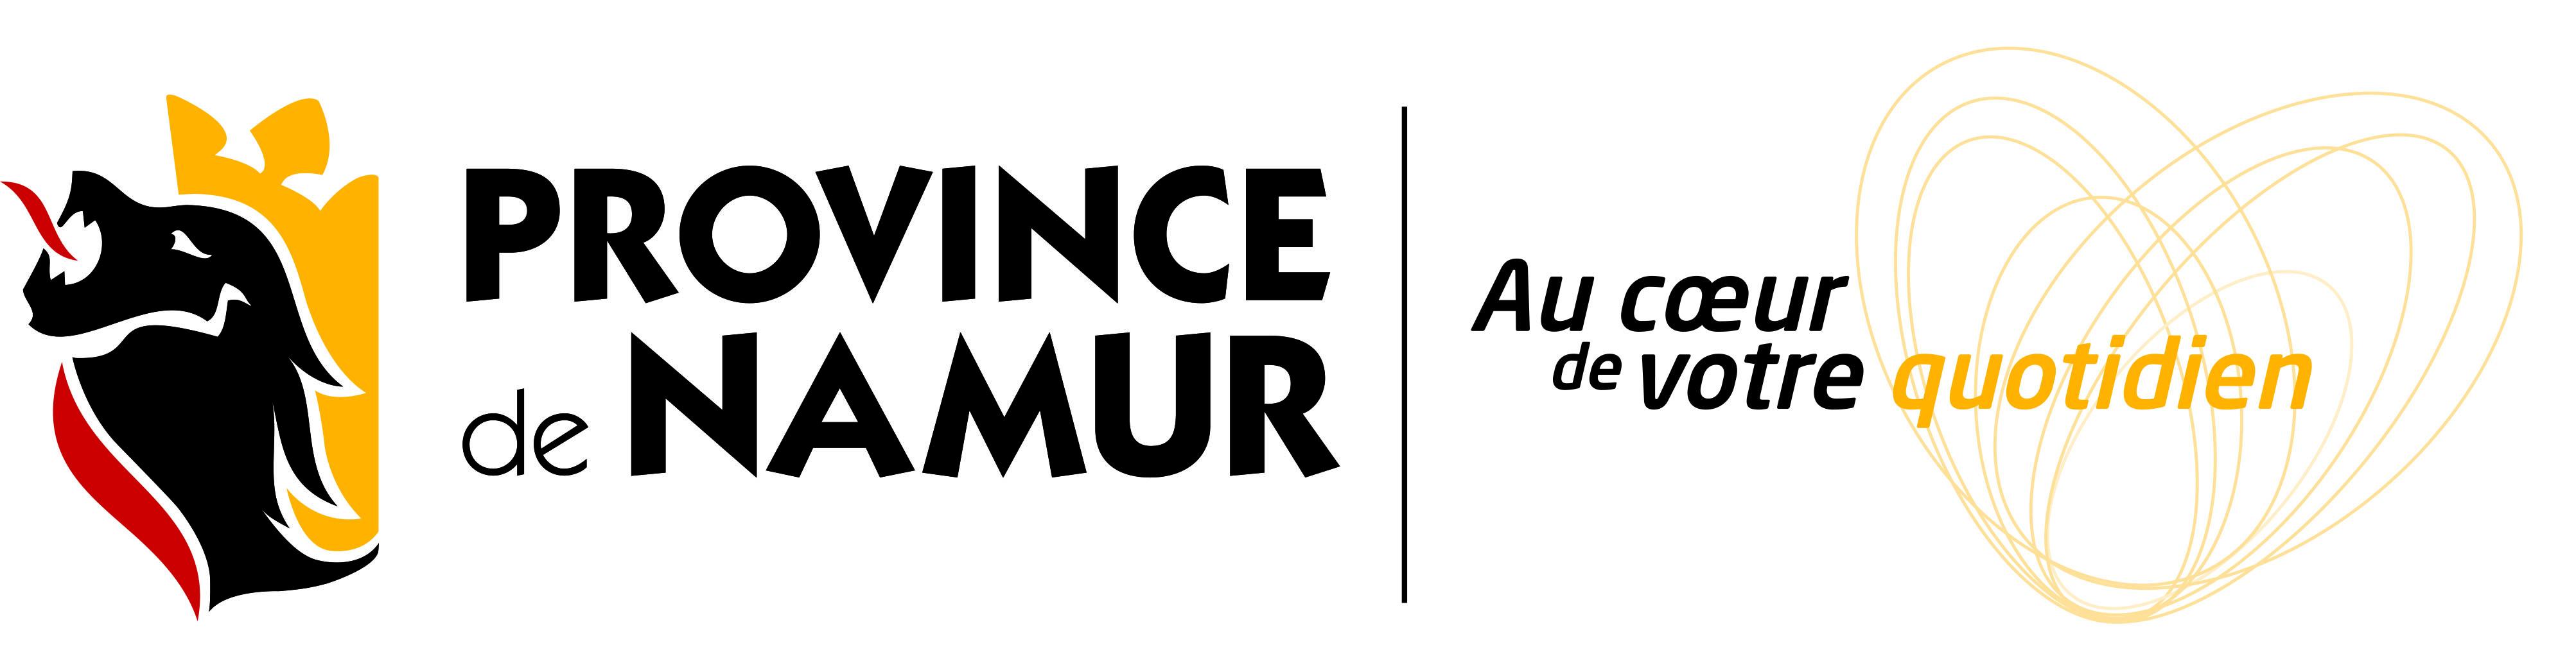 Province de Namur (Chef de file) logo